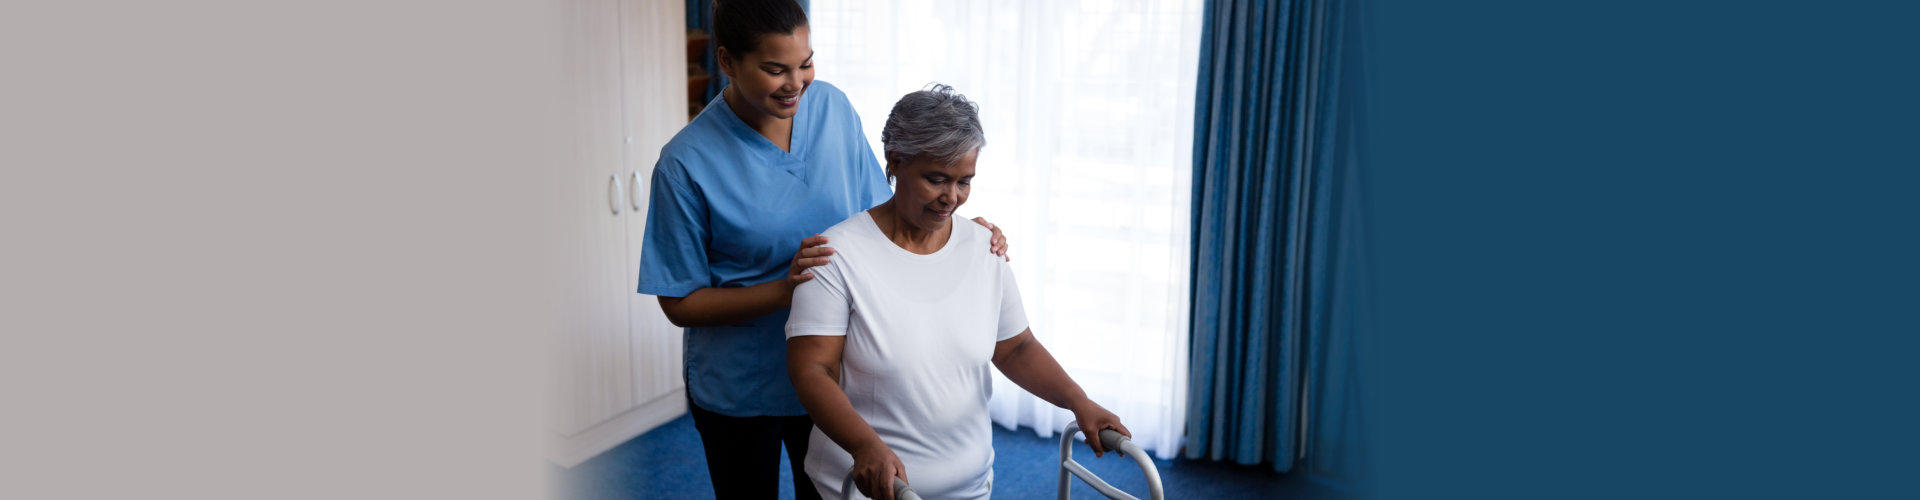 Nurse hepling senior women in walking with walker at nursing home